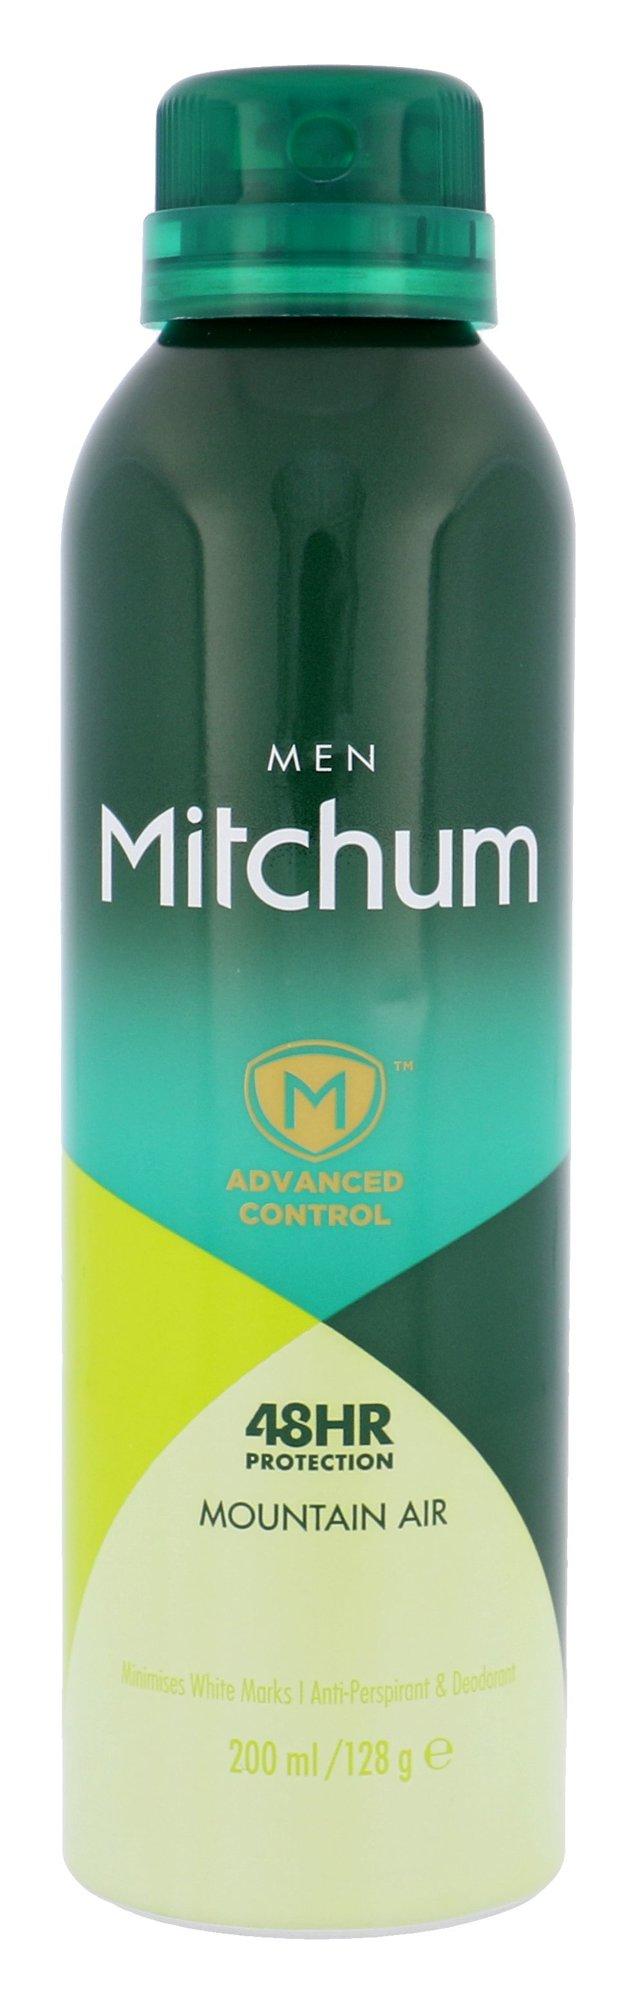 Mitchum Advanced Control Cosmetic 200ml  Mountain Air